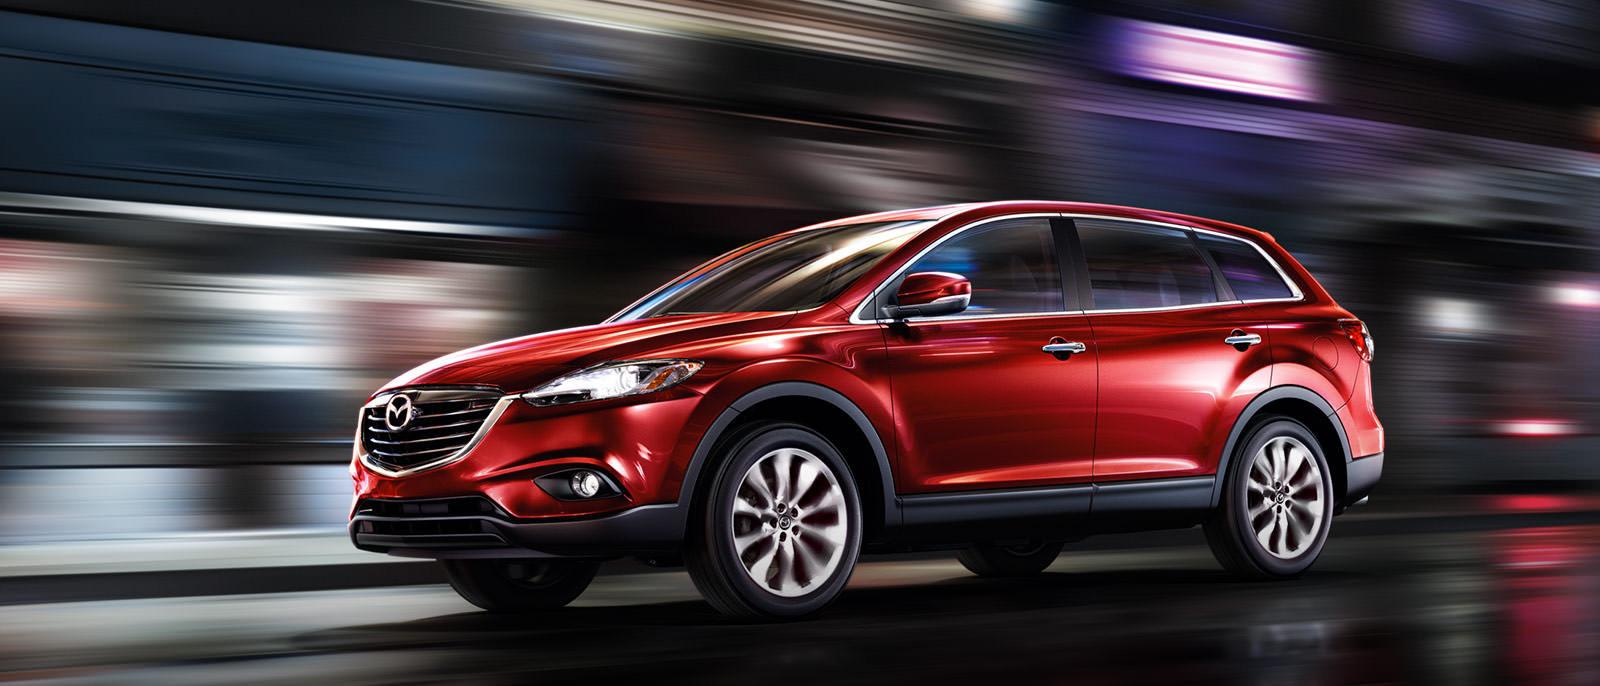 2015 Mazda Cx-9 exterior side